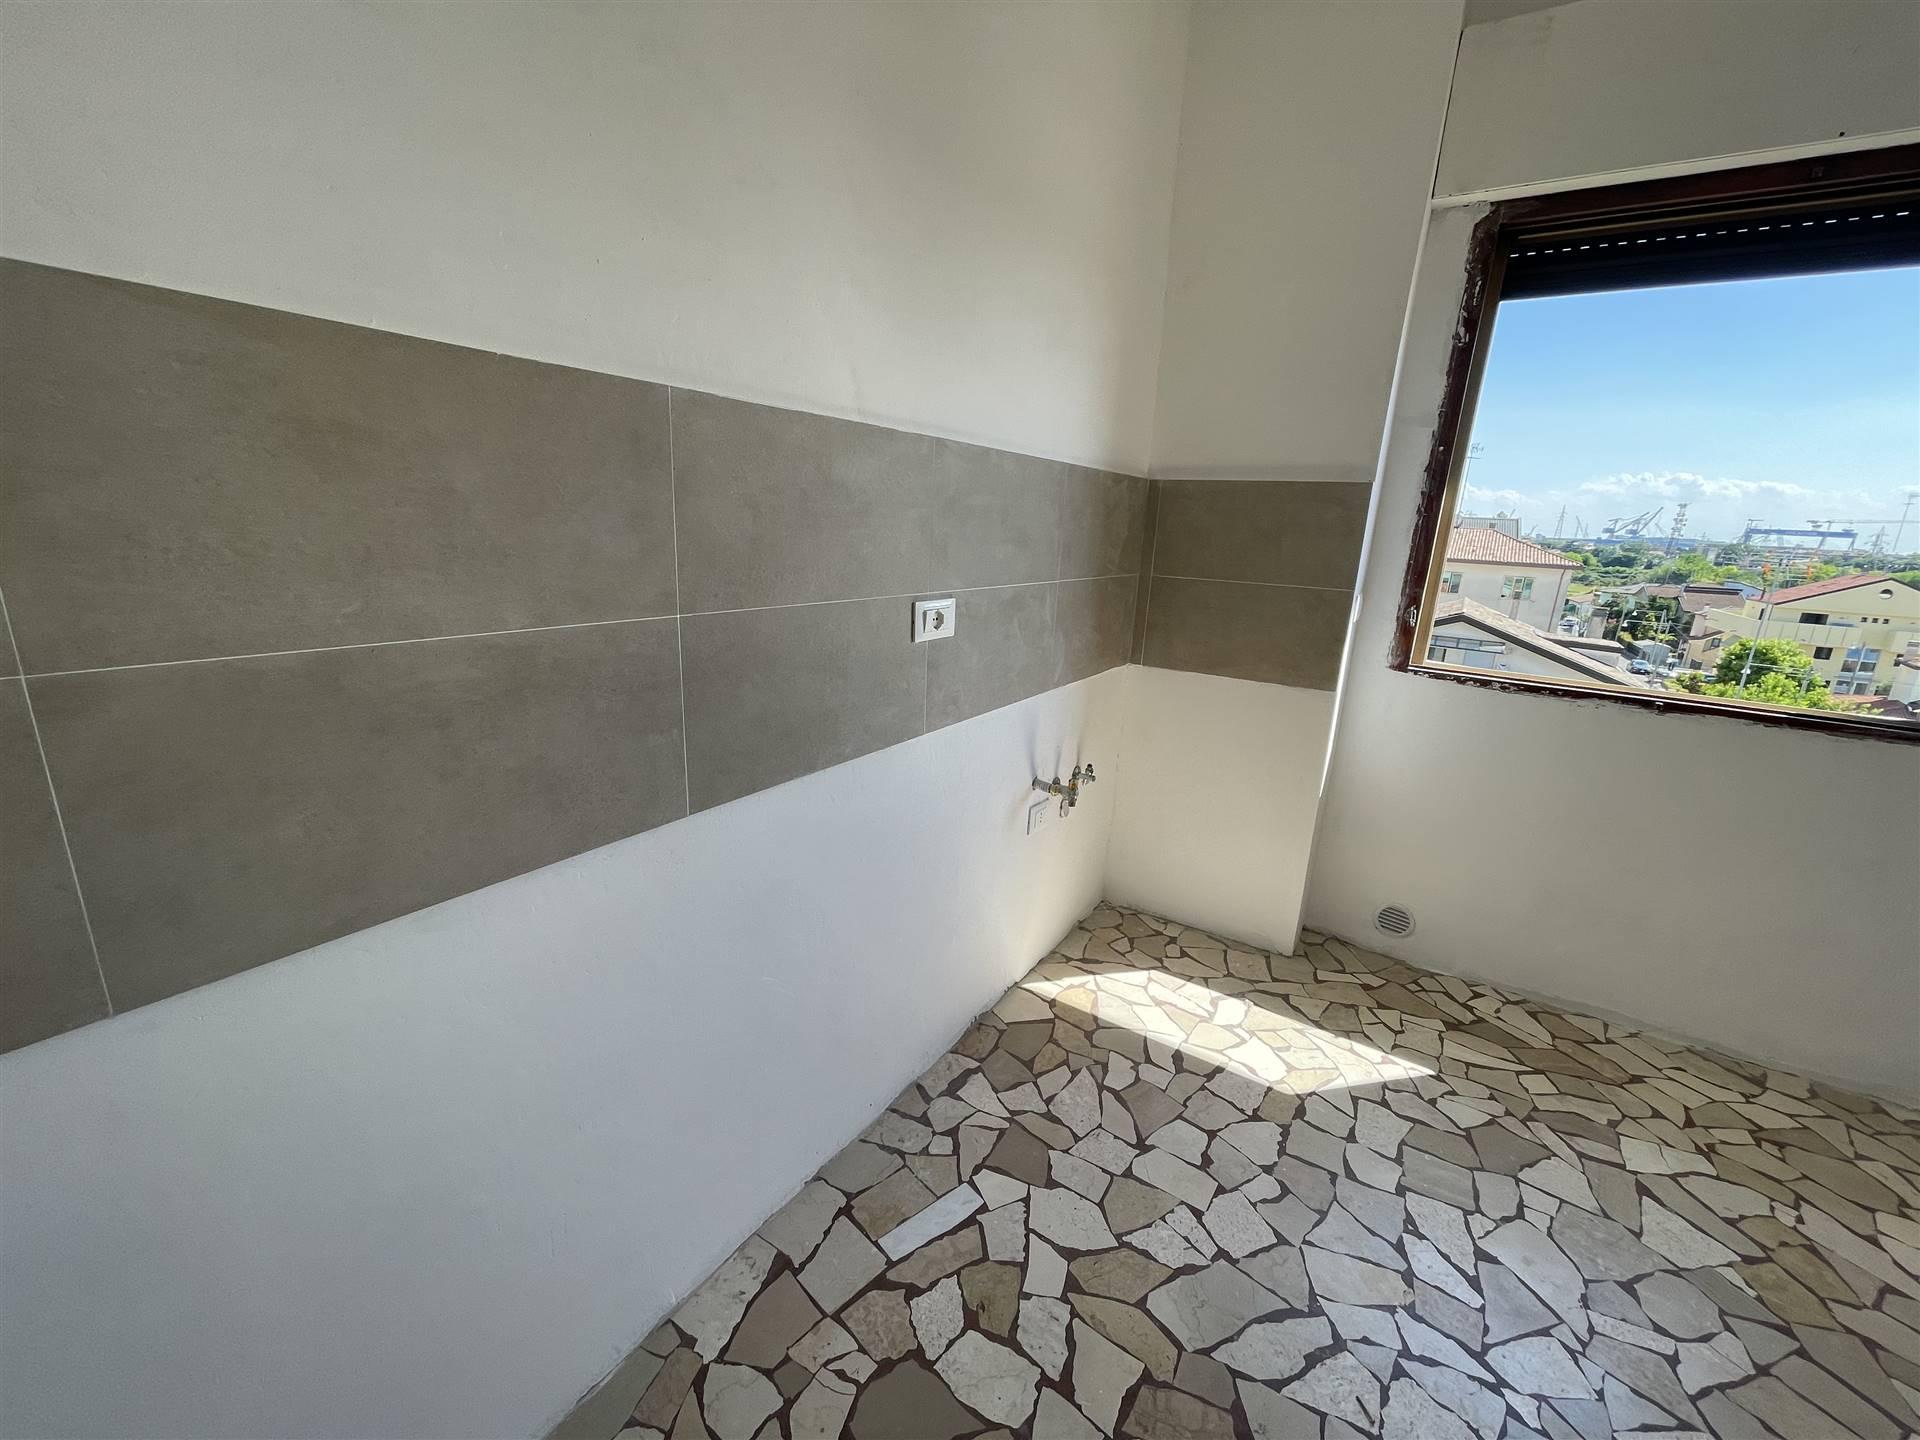 Mestre appartamento restaurato  euro 125.000